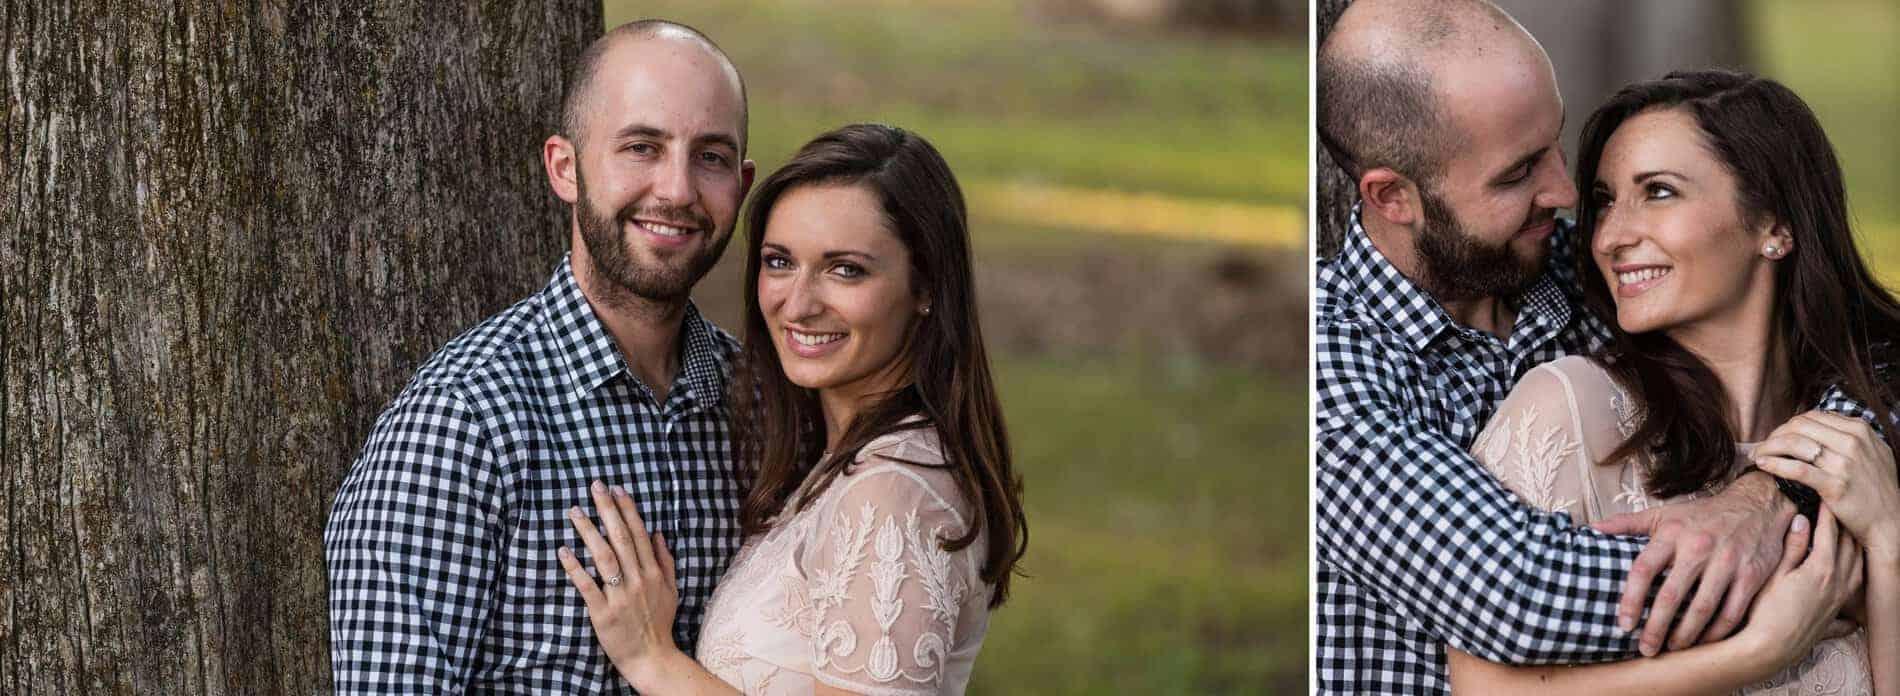 Engaged couple at Kraft Azalea Park